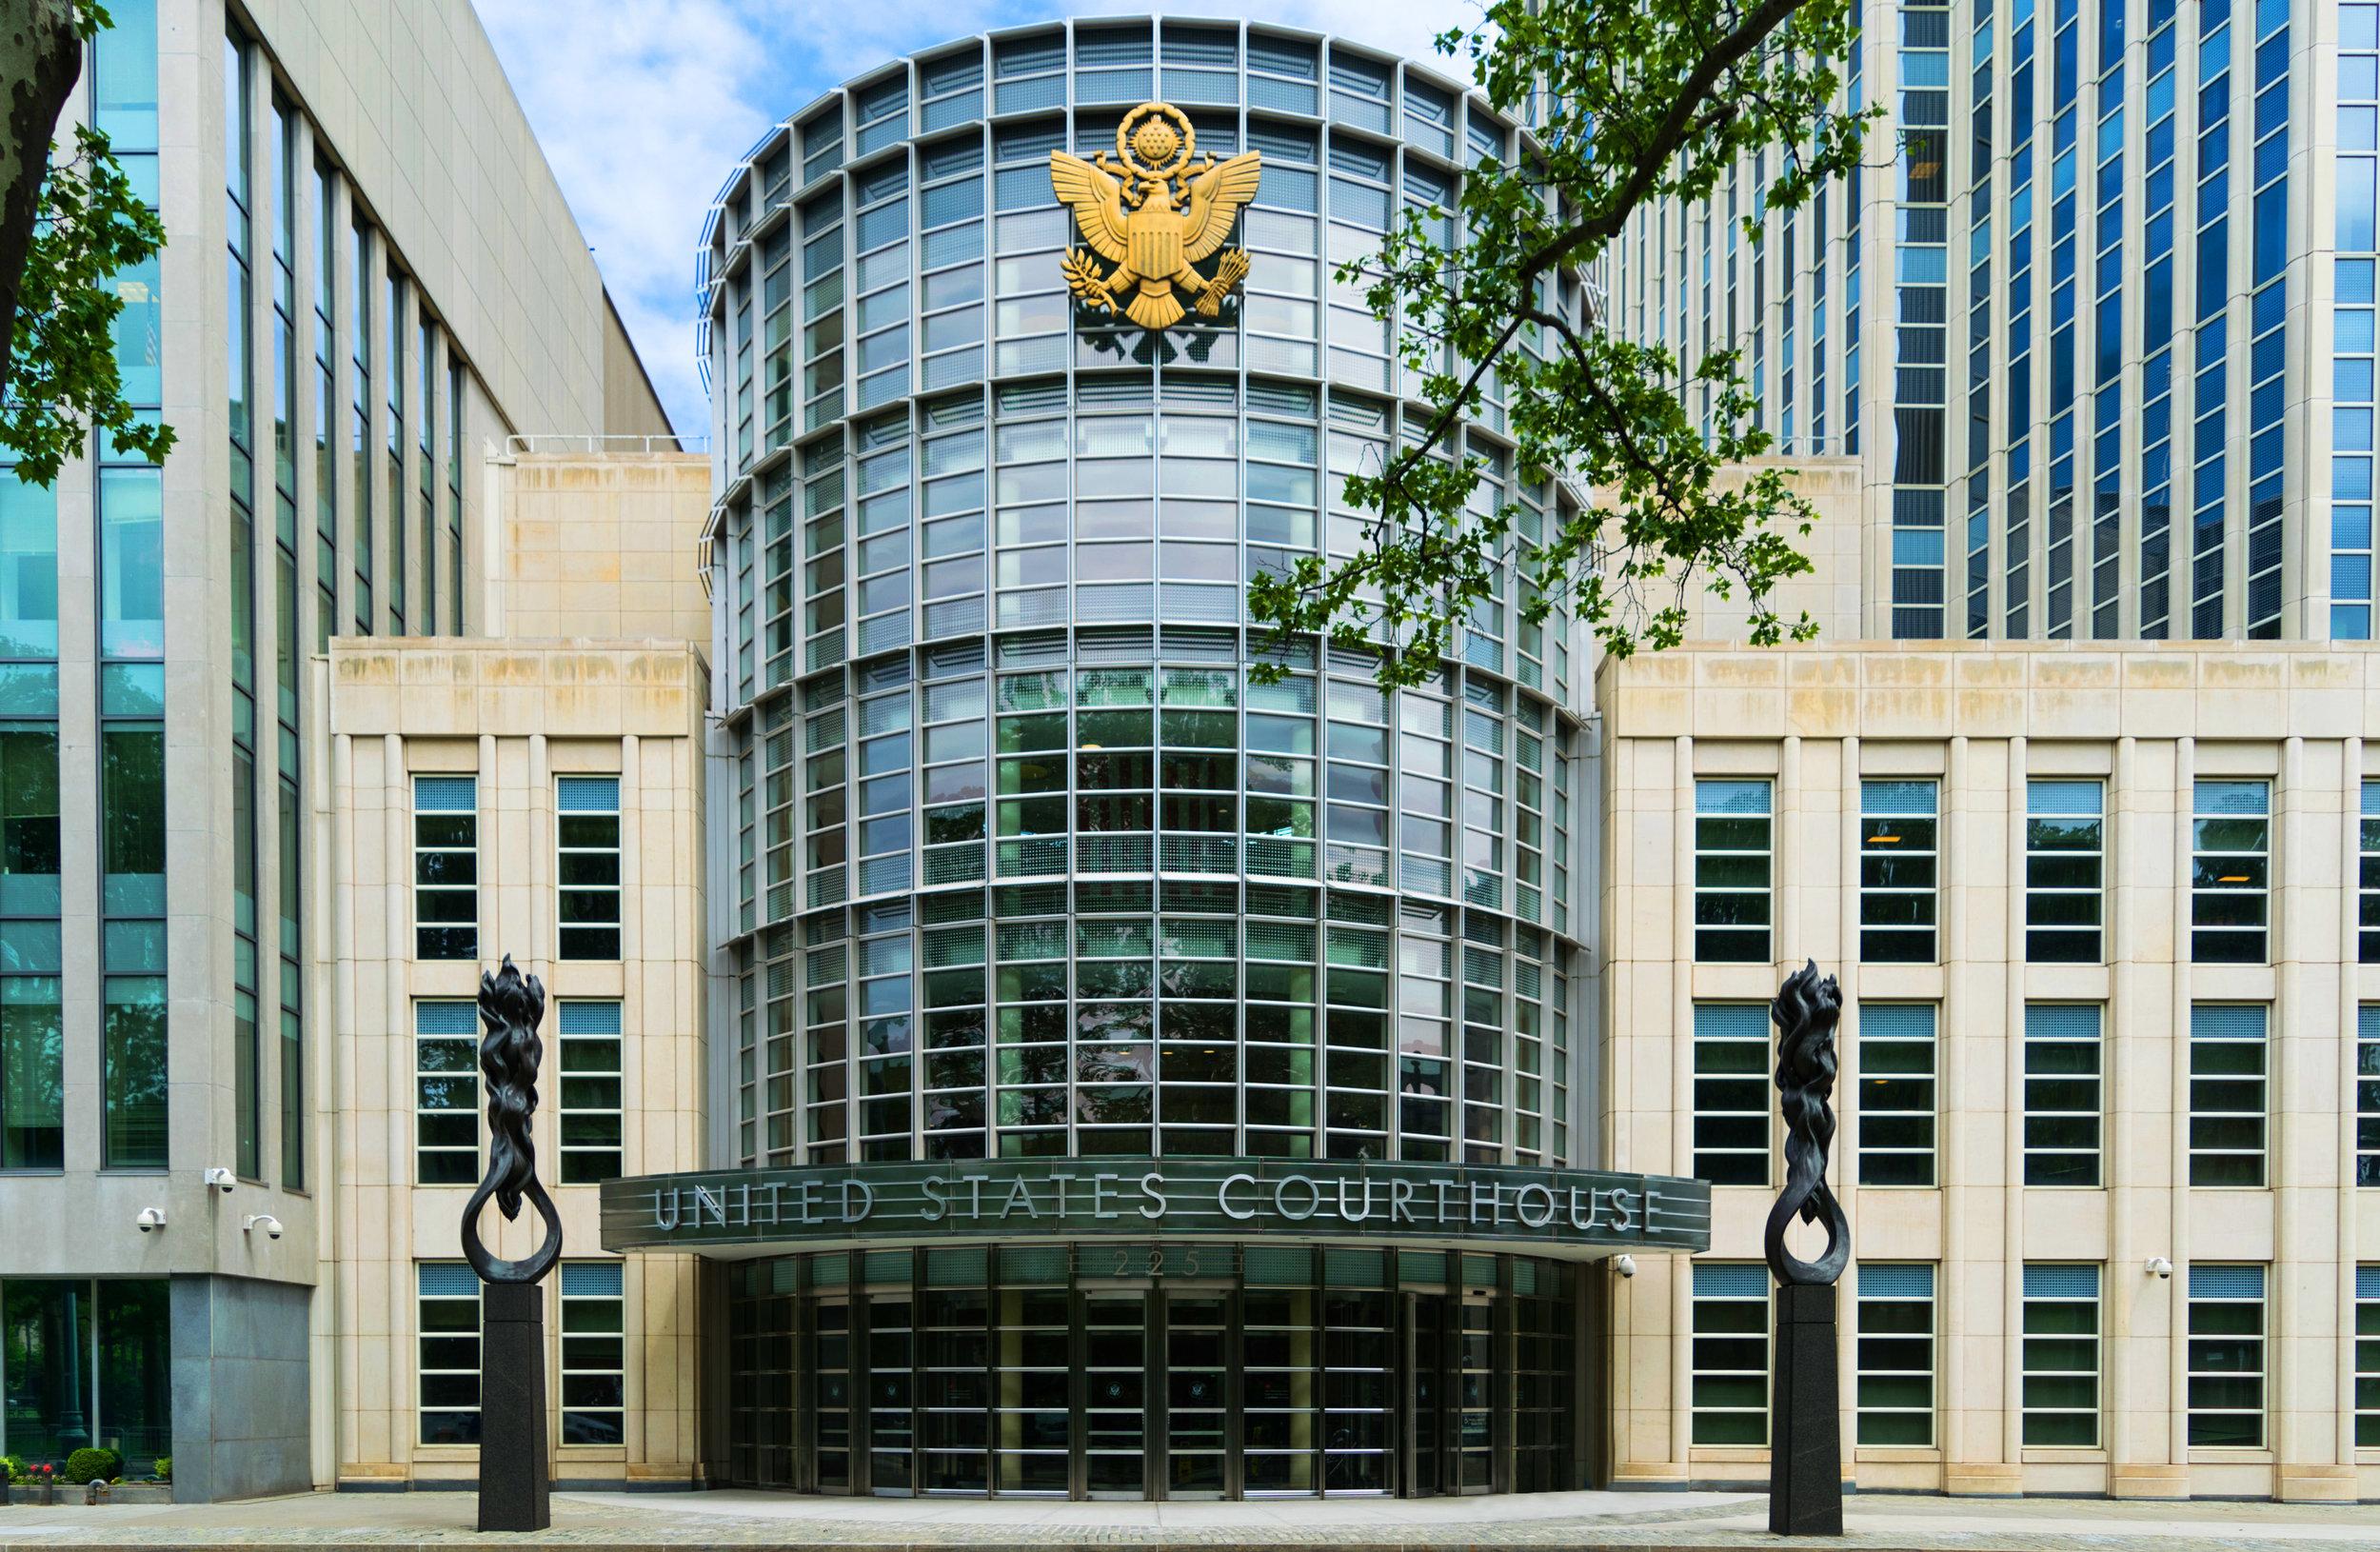 EDNY Courthouse.jpg